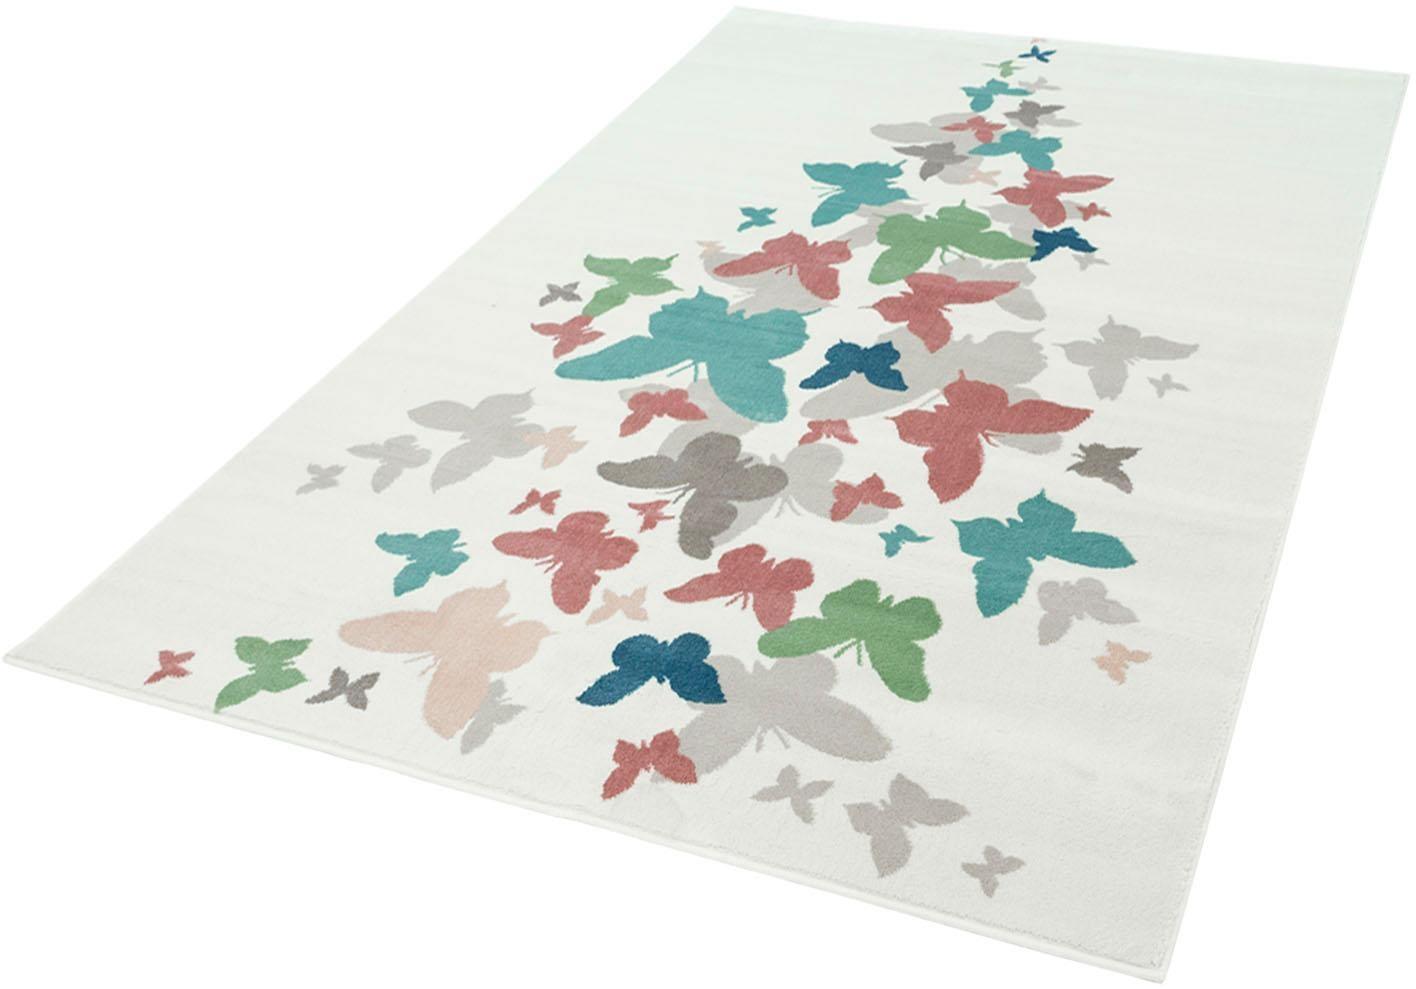 Teppich Inspiration 5799 Carpet City rechteckig Höhe 11 mm maschinell zusammengesetzt